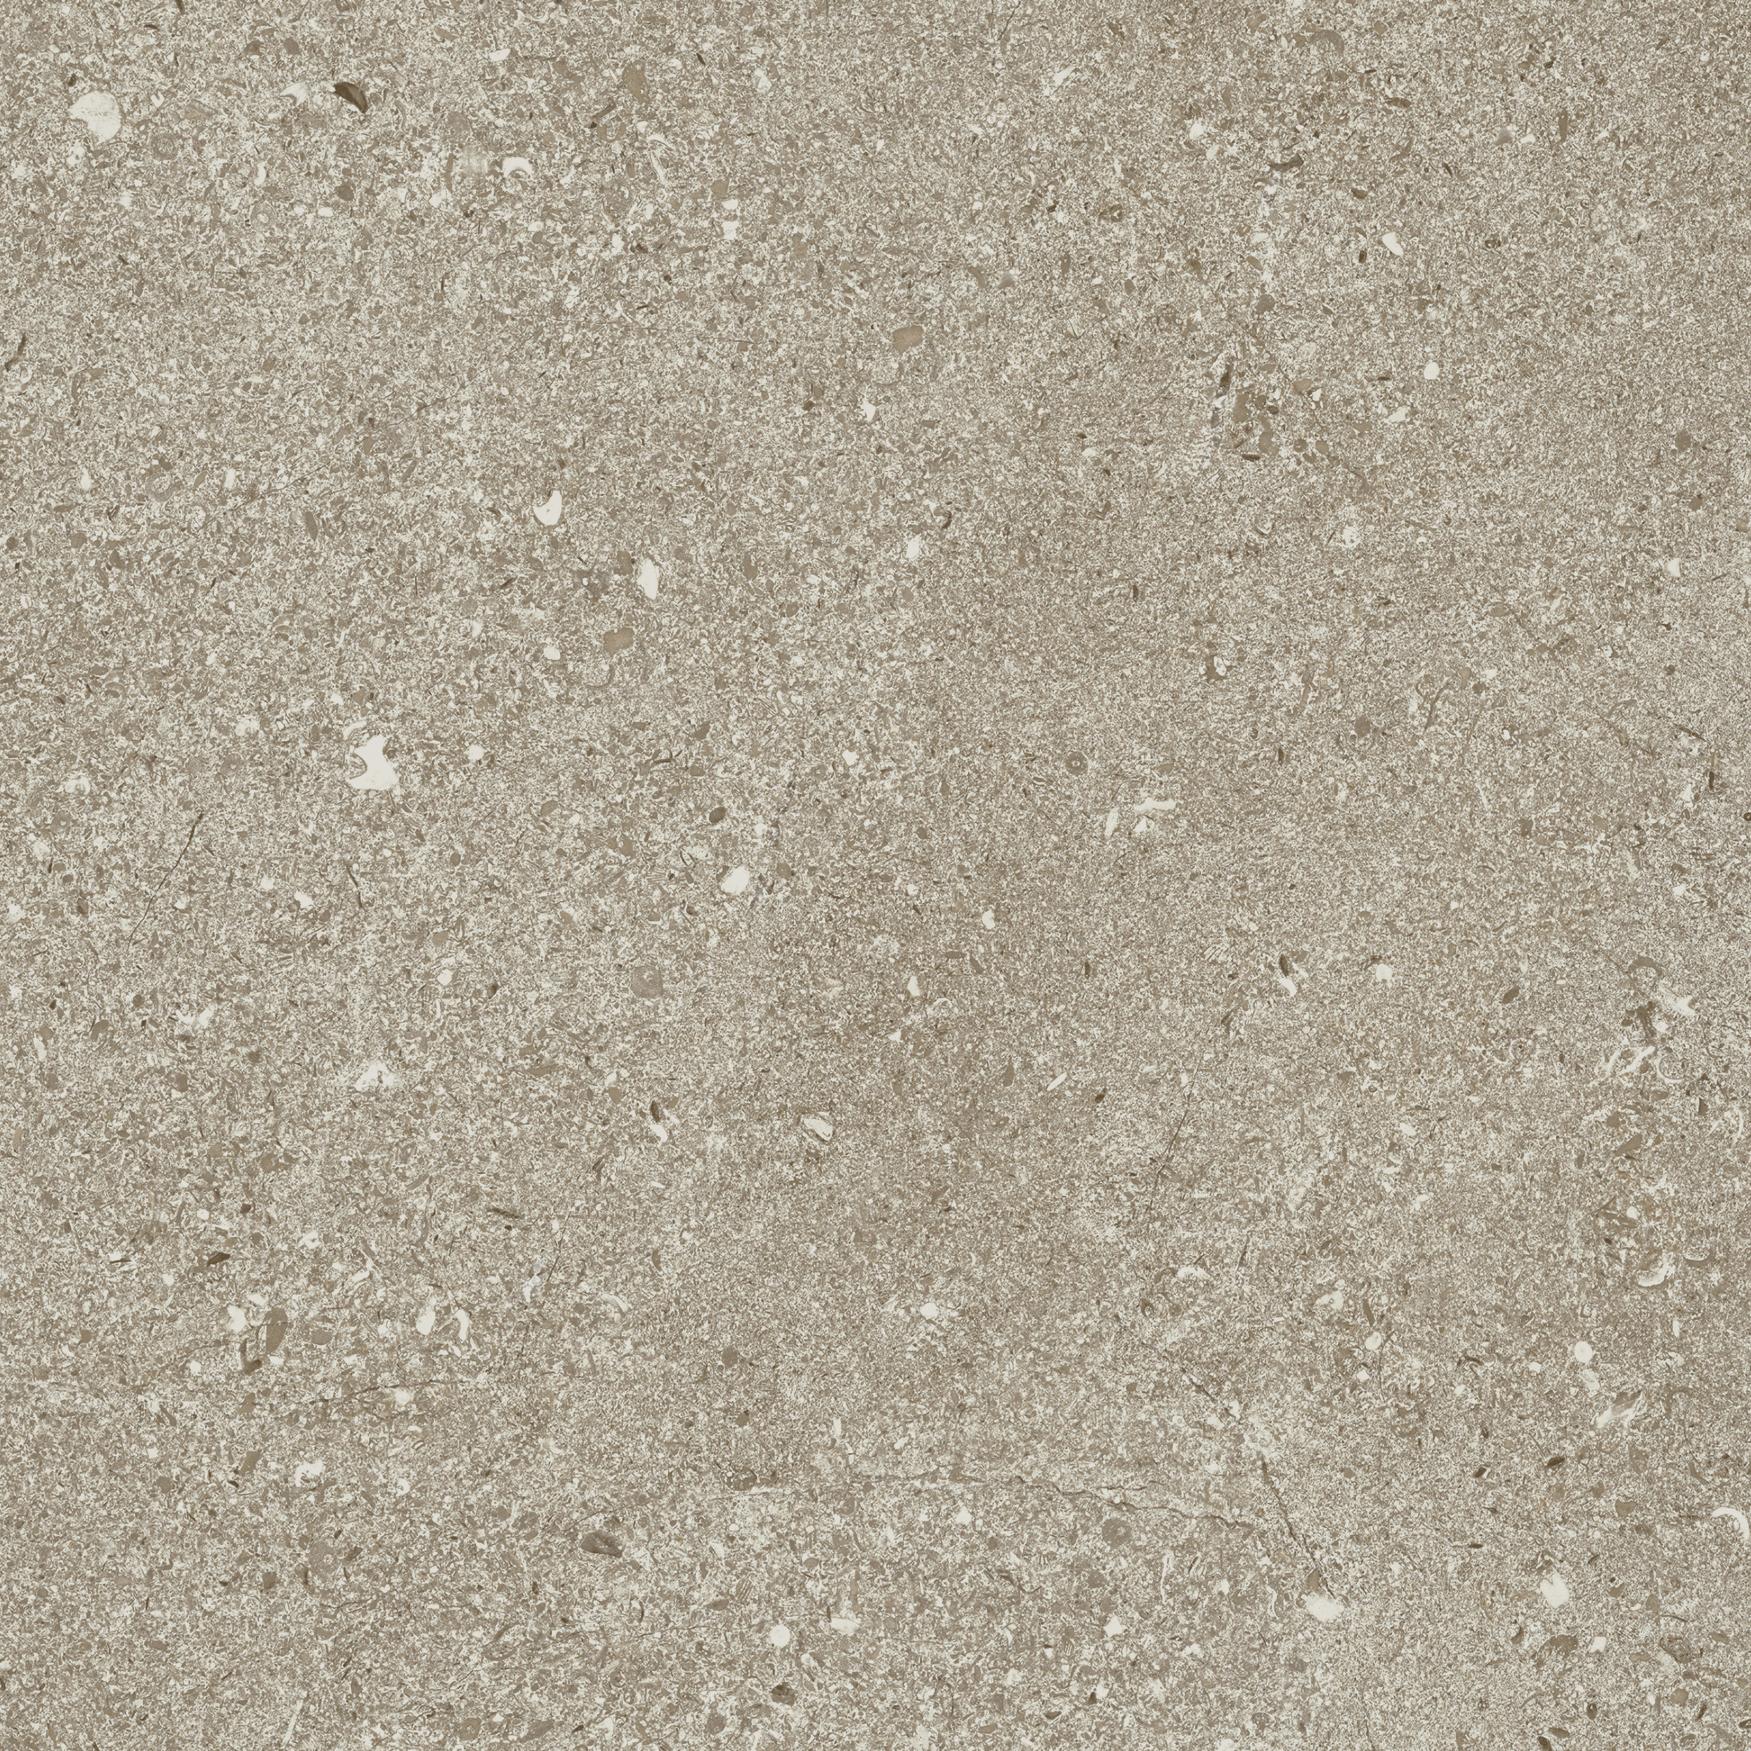 beige Steinoptik Fliese, beige stone effect tile 60x60